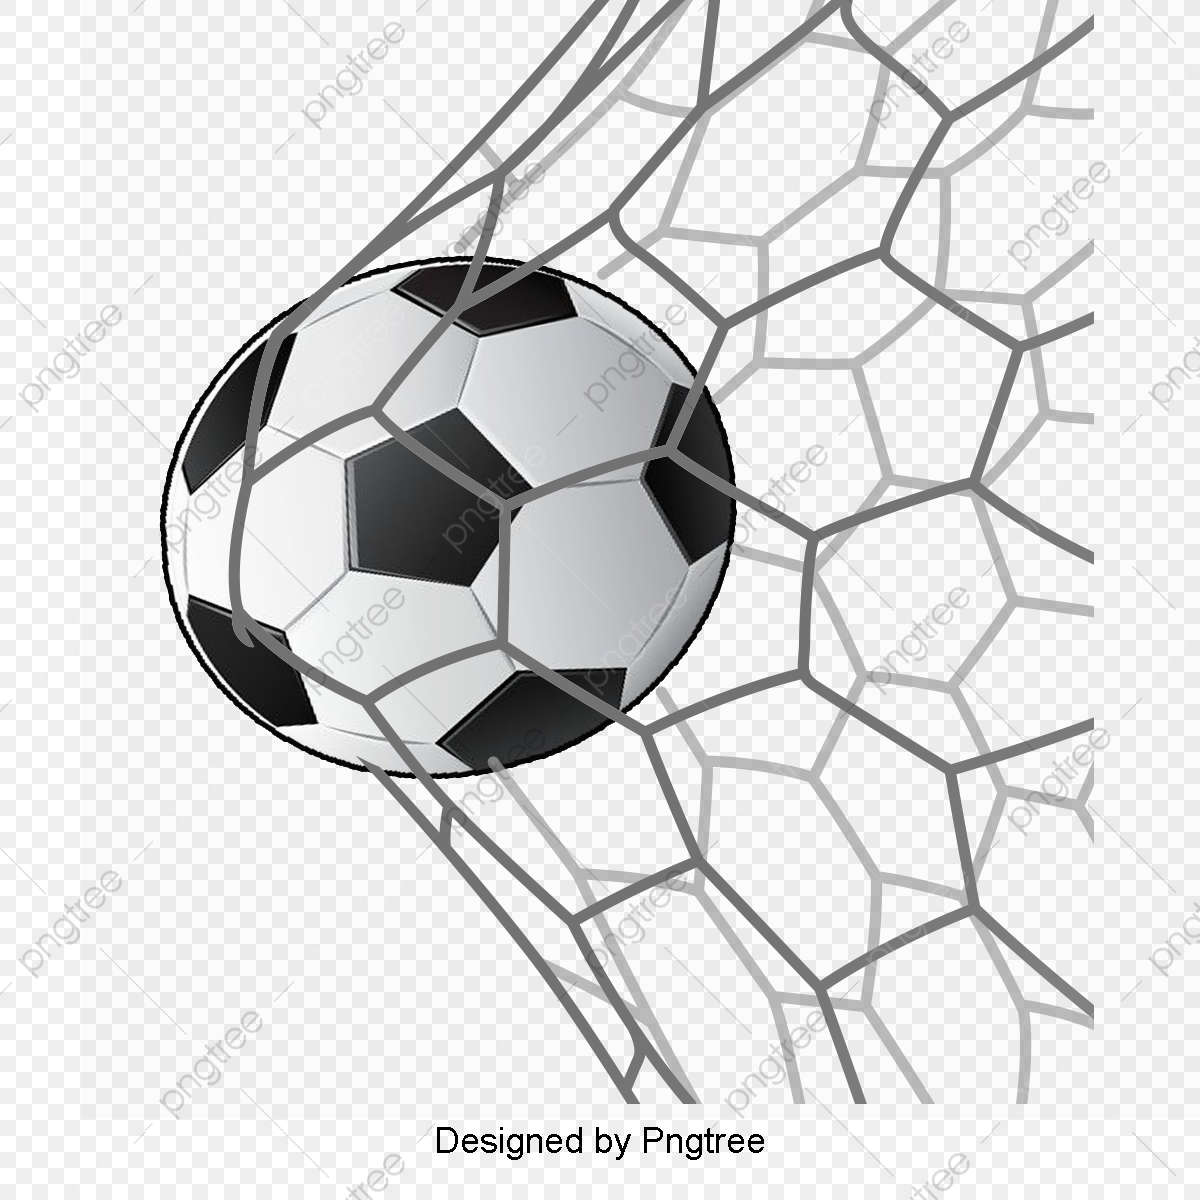 Hand Painted Football Goals, Football Clipart, Movement, Football.